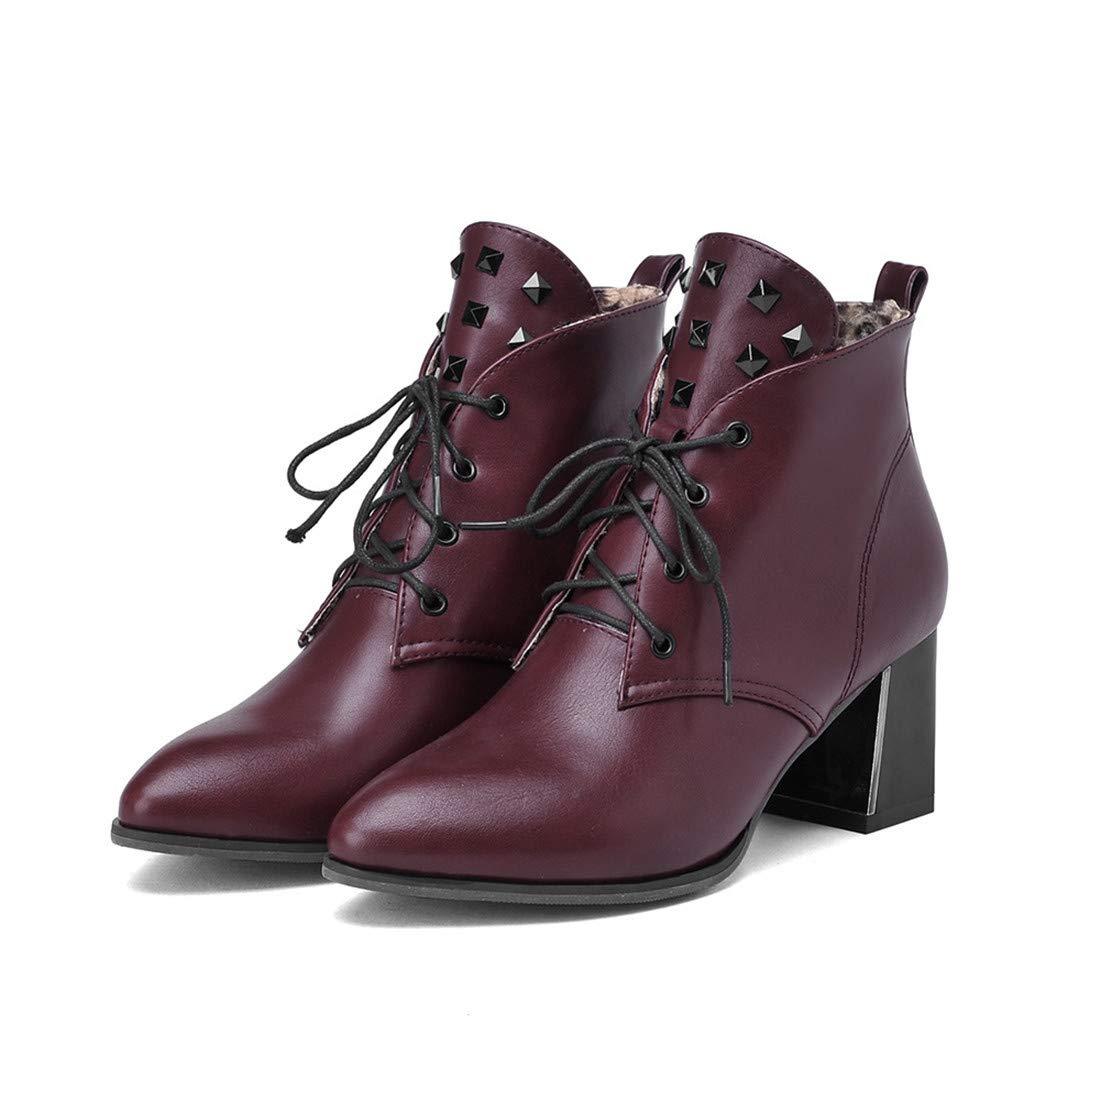 GOSCH SHOES Damen Schuhe Chelsea Boots Stiefelette 7105 320